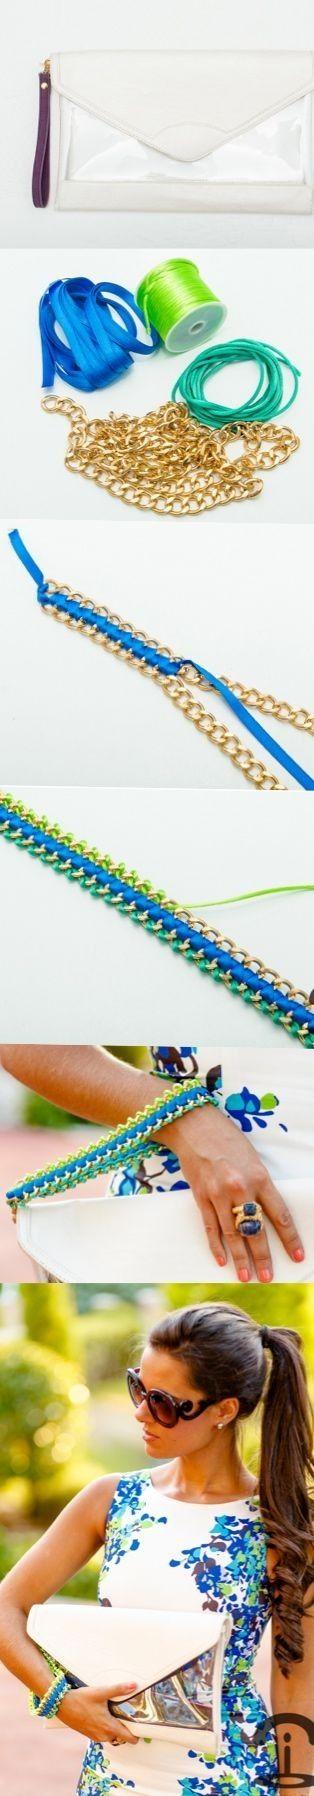 Crimenes de la Moda: DIY Neon Chain Clutch by Morwen